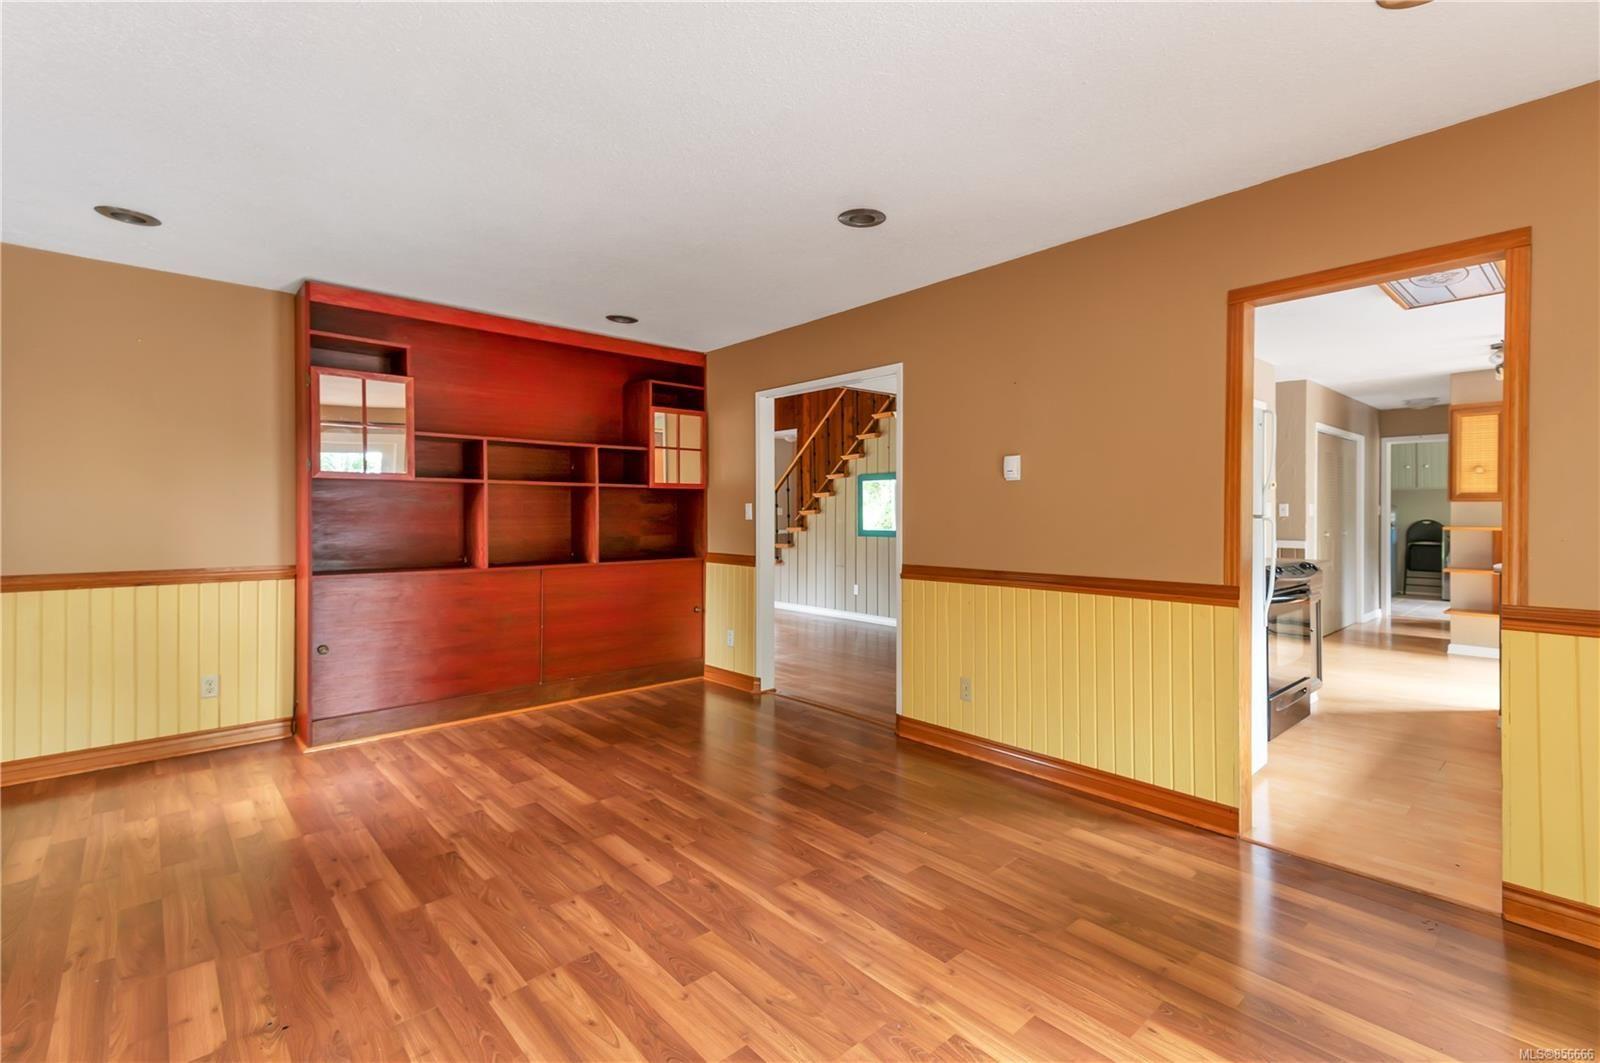 Photo 14: Photos: 2468 Oakes Rd in : CV Merville Black Creek House for sale (Comox Valley)  : MLS®# 856666